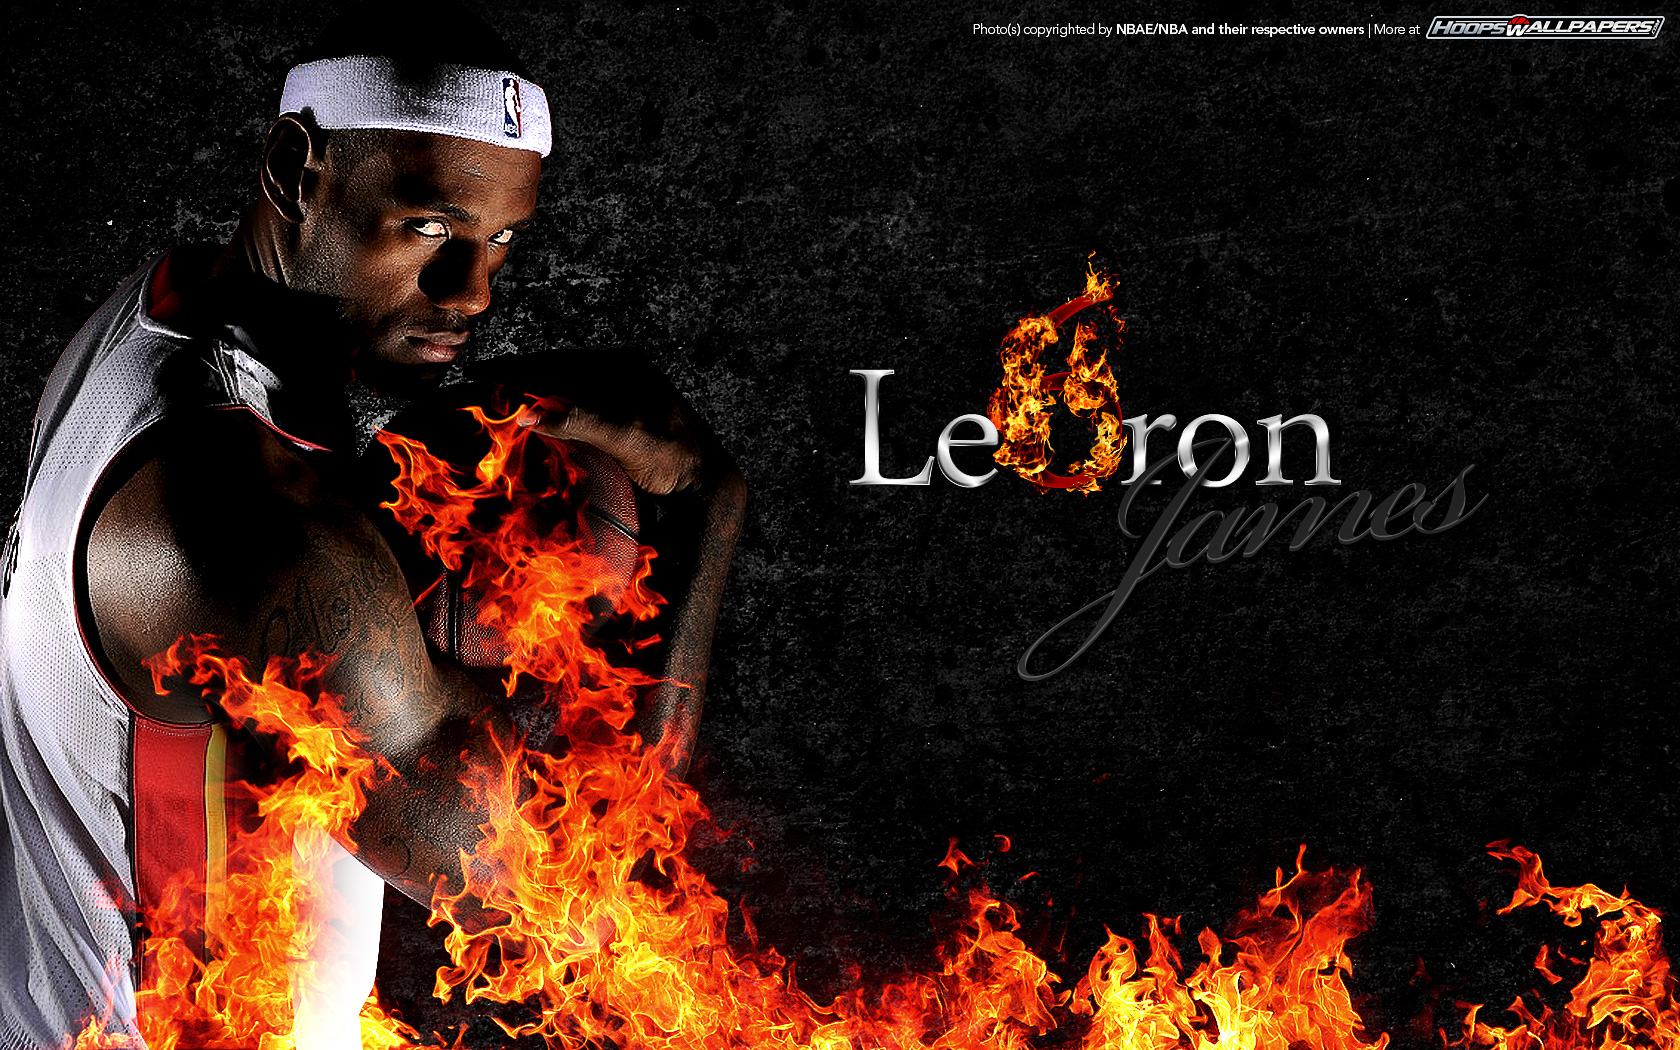 LeBron James Desktop Wallpapers Browser Themes 1680x1050